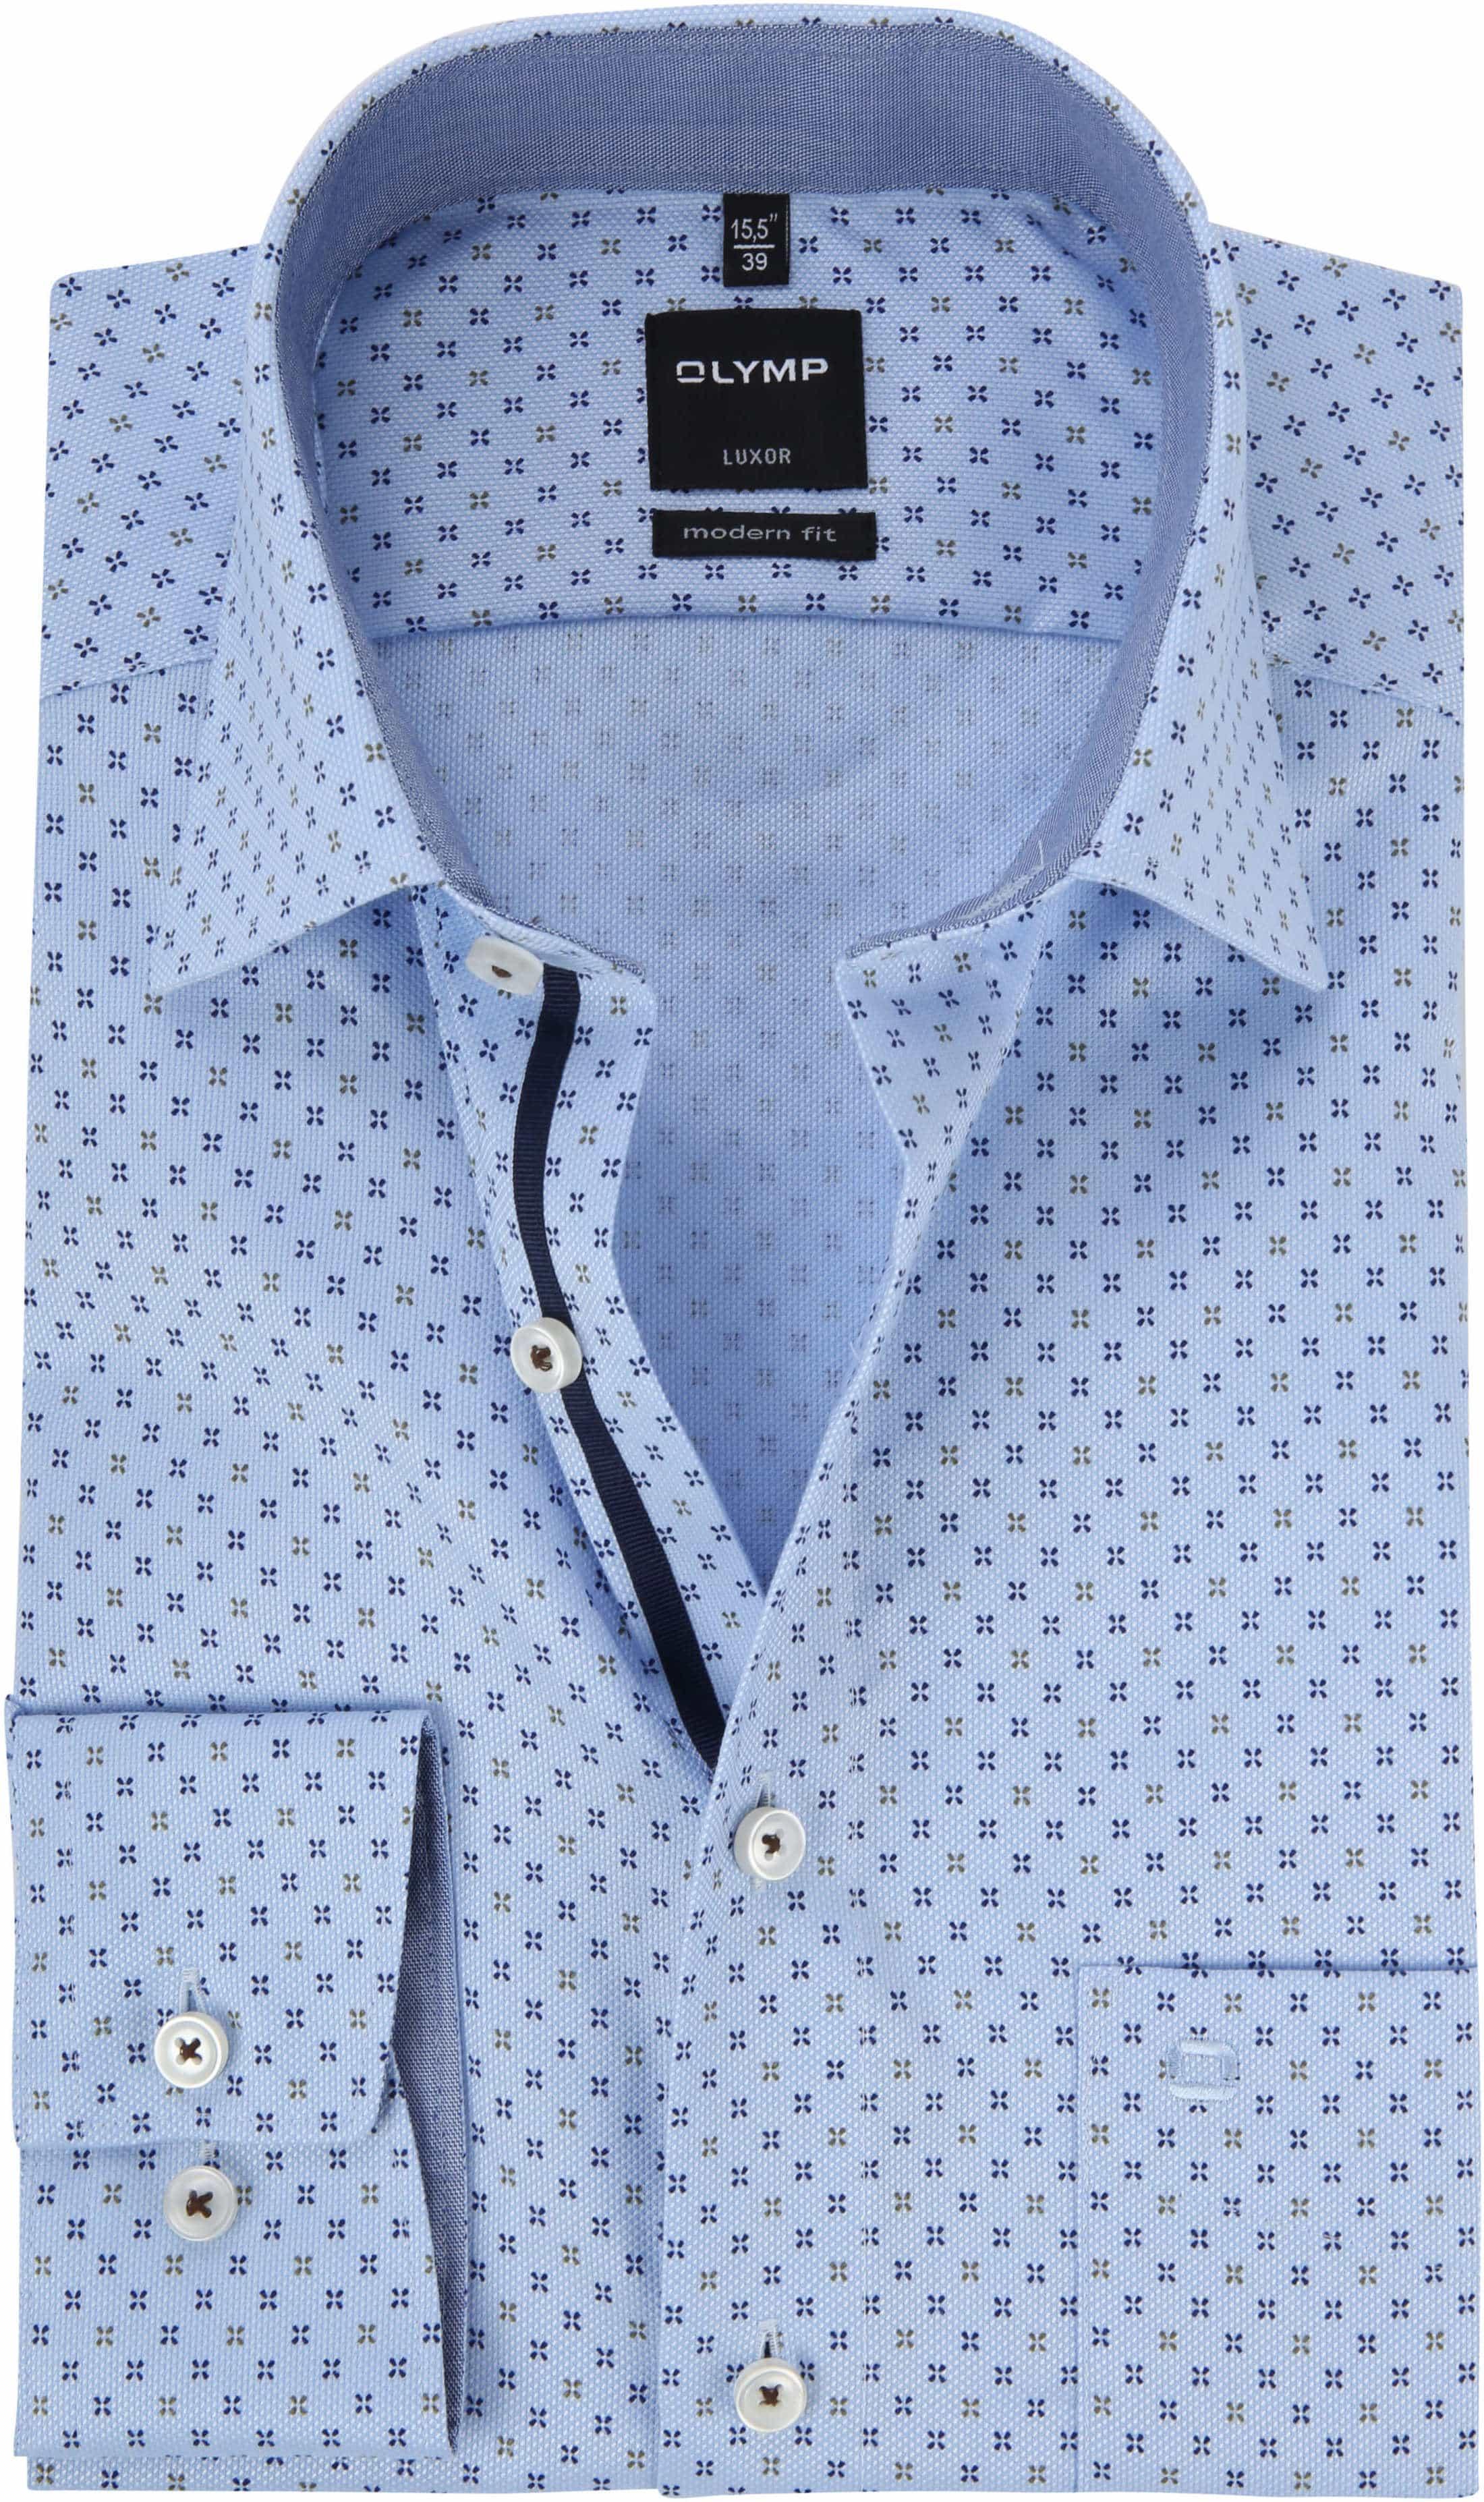 OLYMP Luxor Blau Hemd MF 125234 online kaufen | Suitable